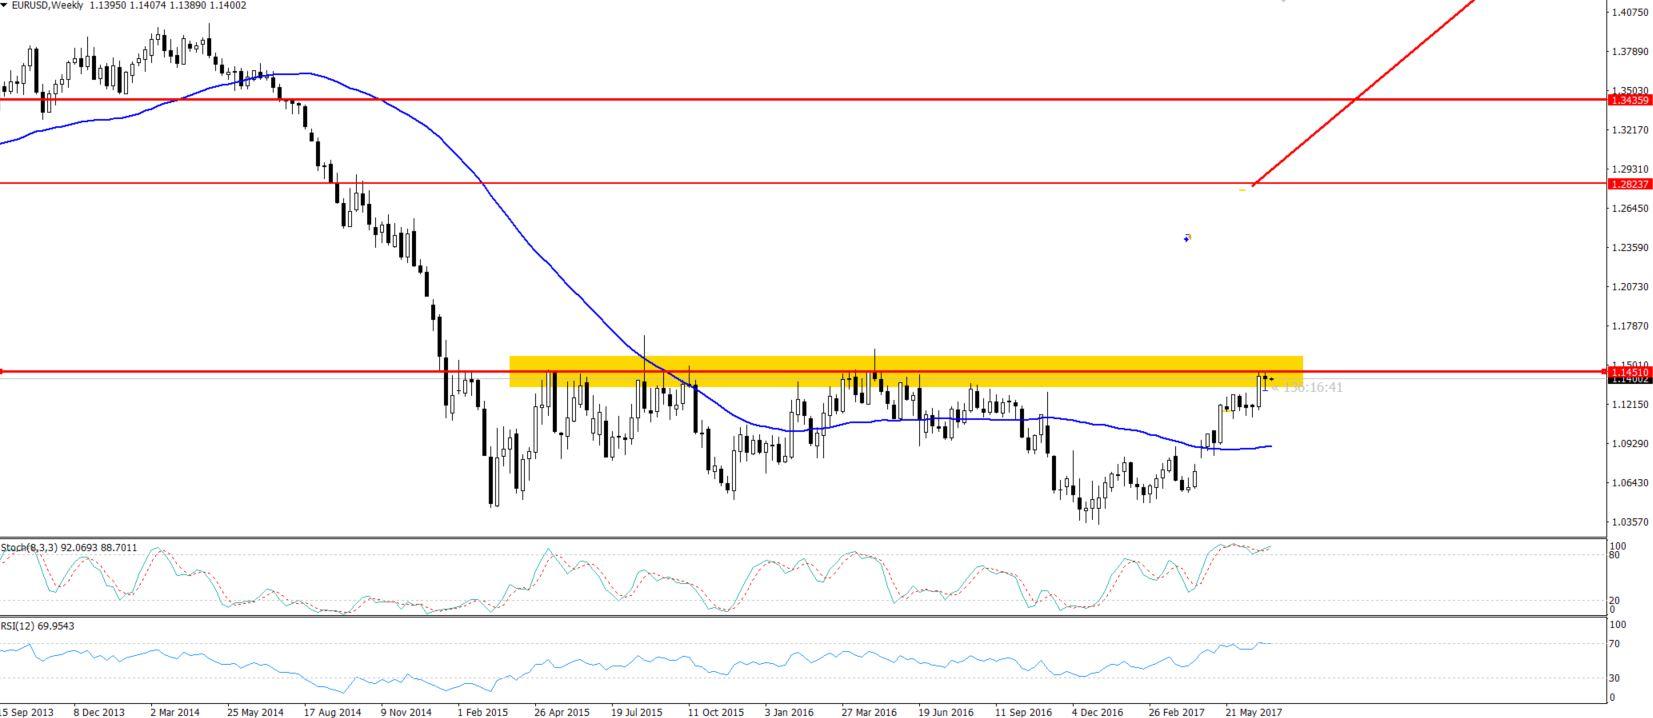 EURUSD - Weekly Chart - Triple Top Pattern